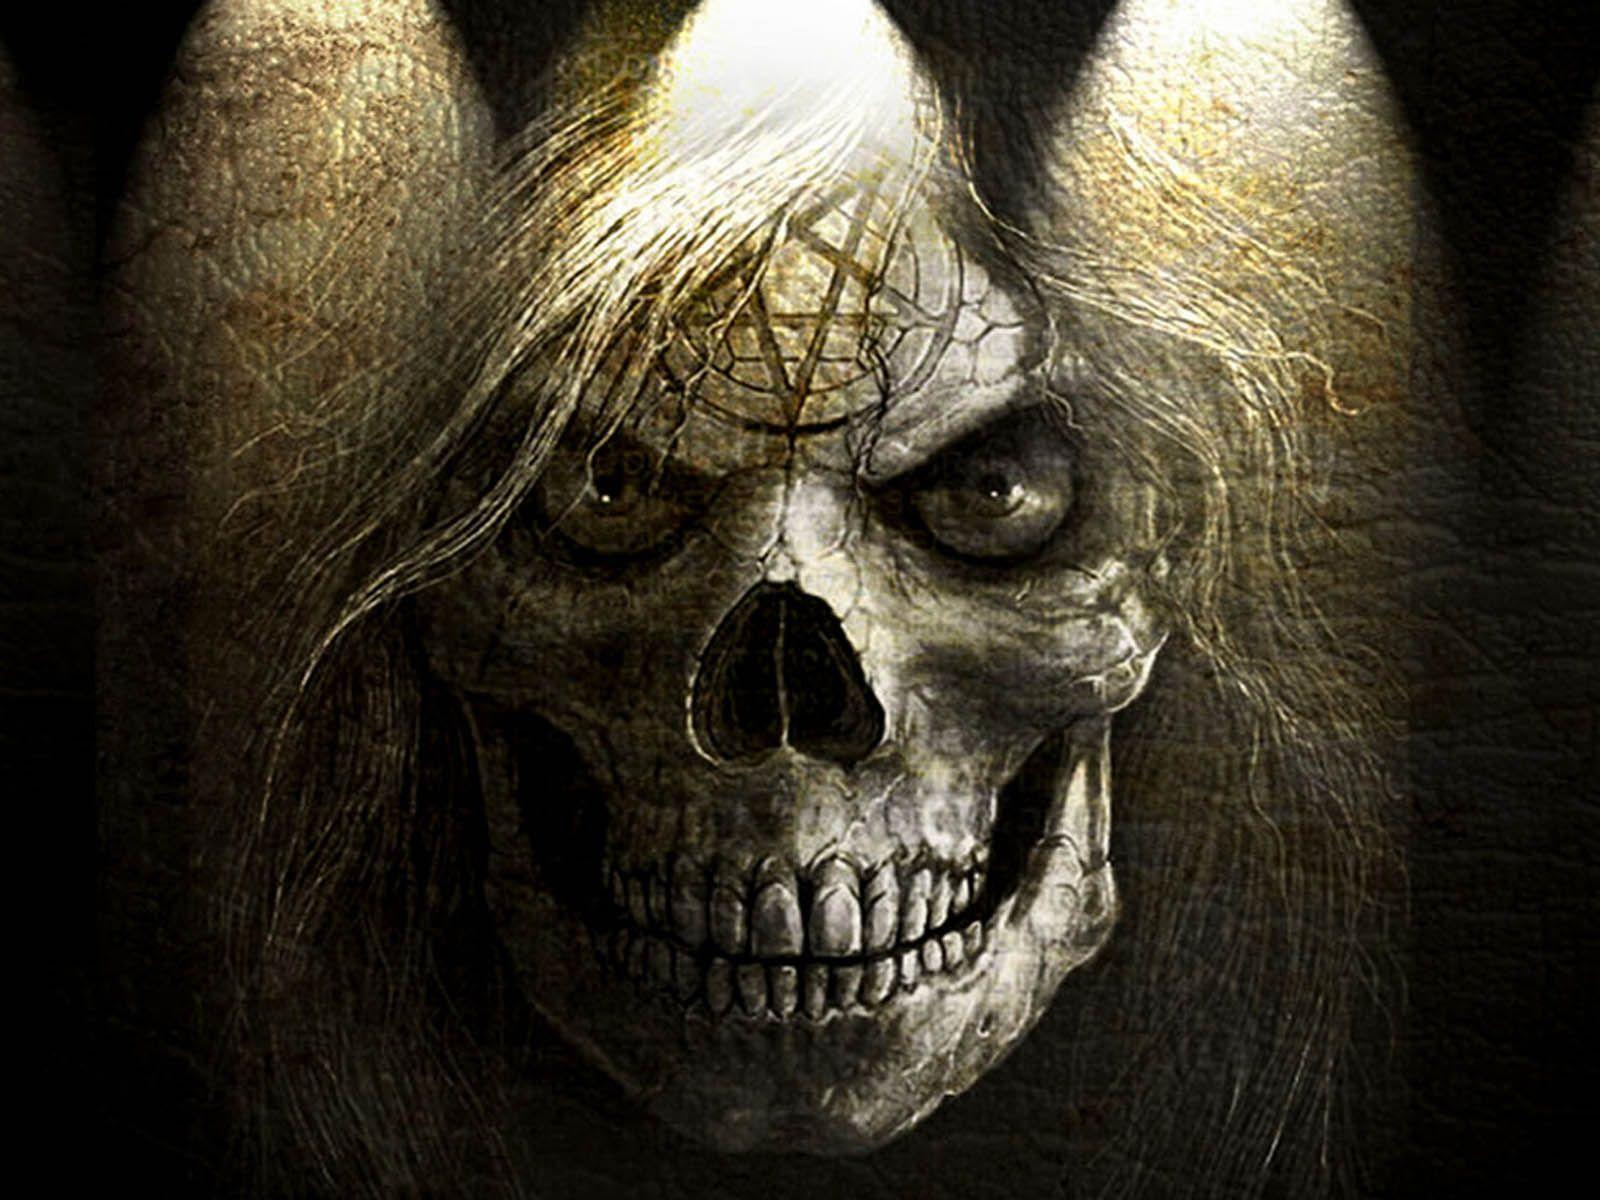 Wallpapers Horror Skull Wallpapers Skull Wallpaper Horror Wallpapers Hd Scary Wallpaper